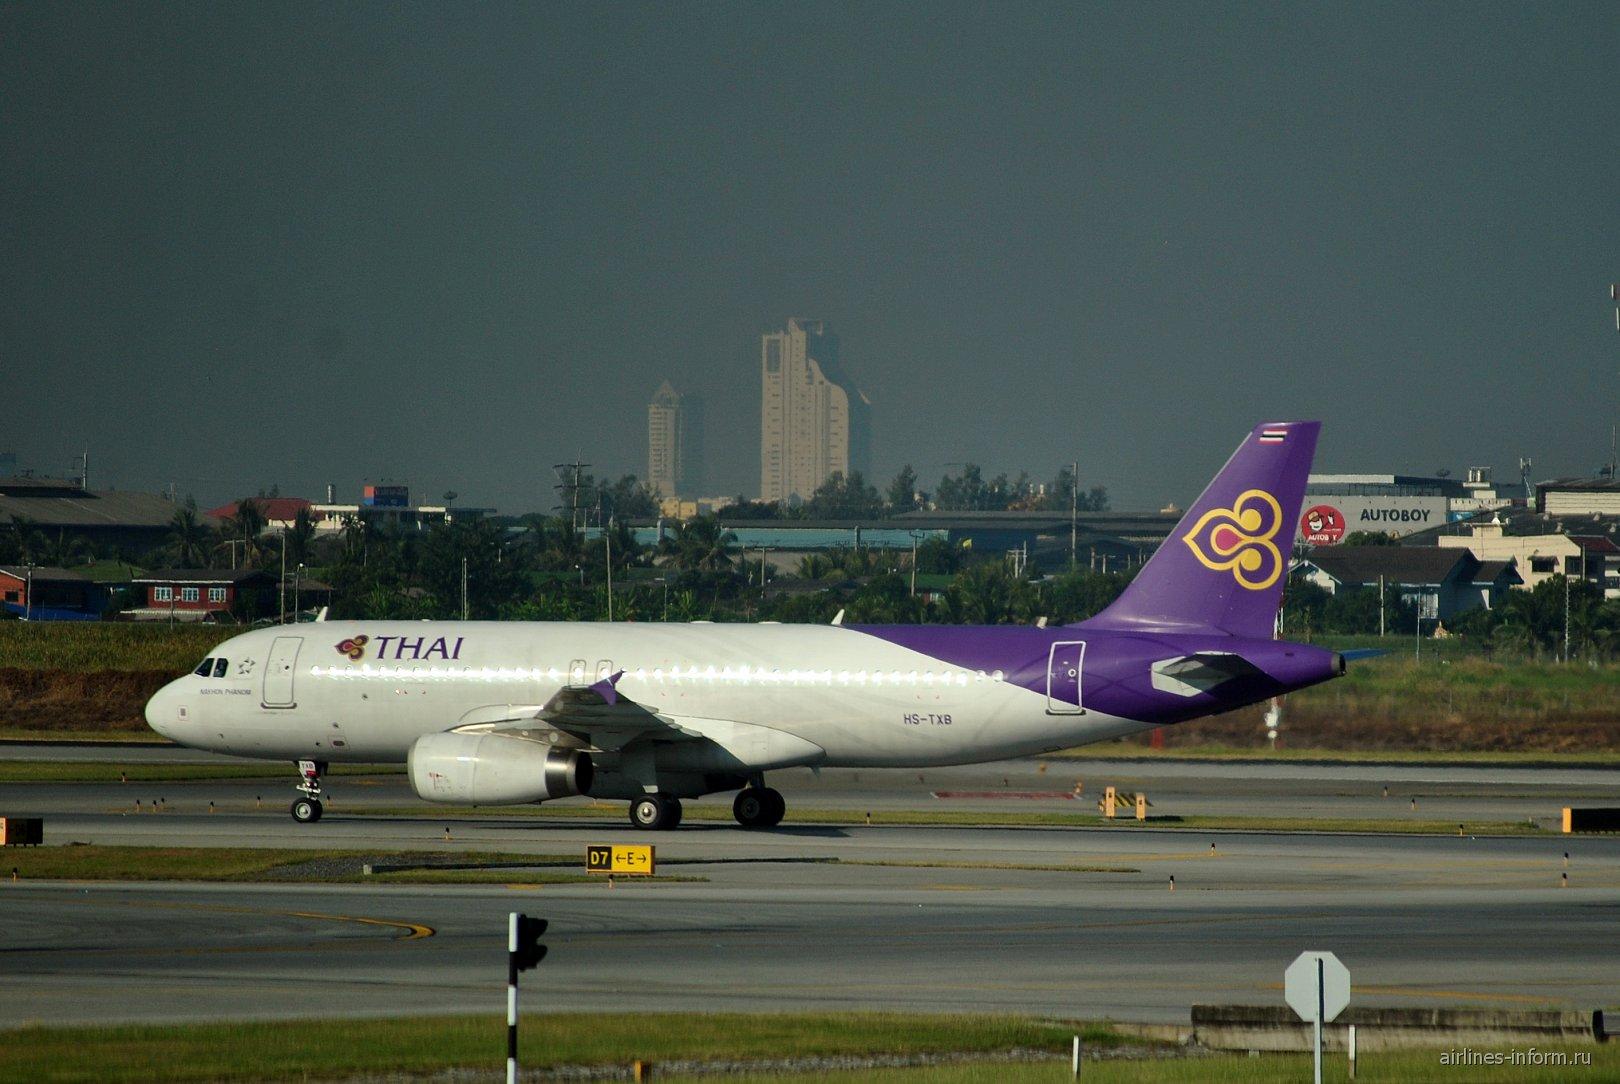 Airbus A320 HS-TXB авиакомпании Thai Airways в аэропорту Бангкок Суварнабуми